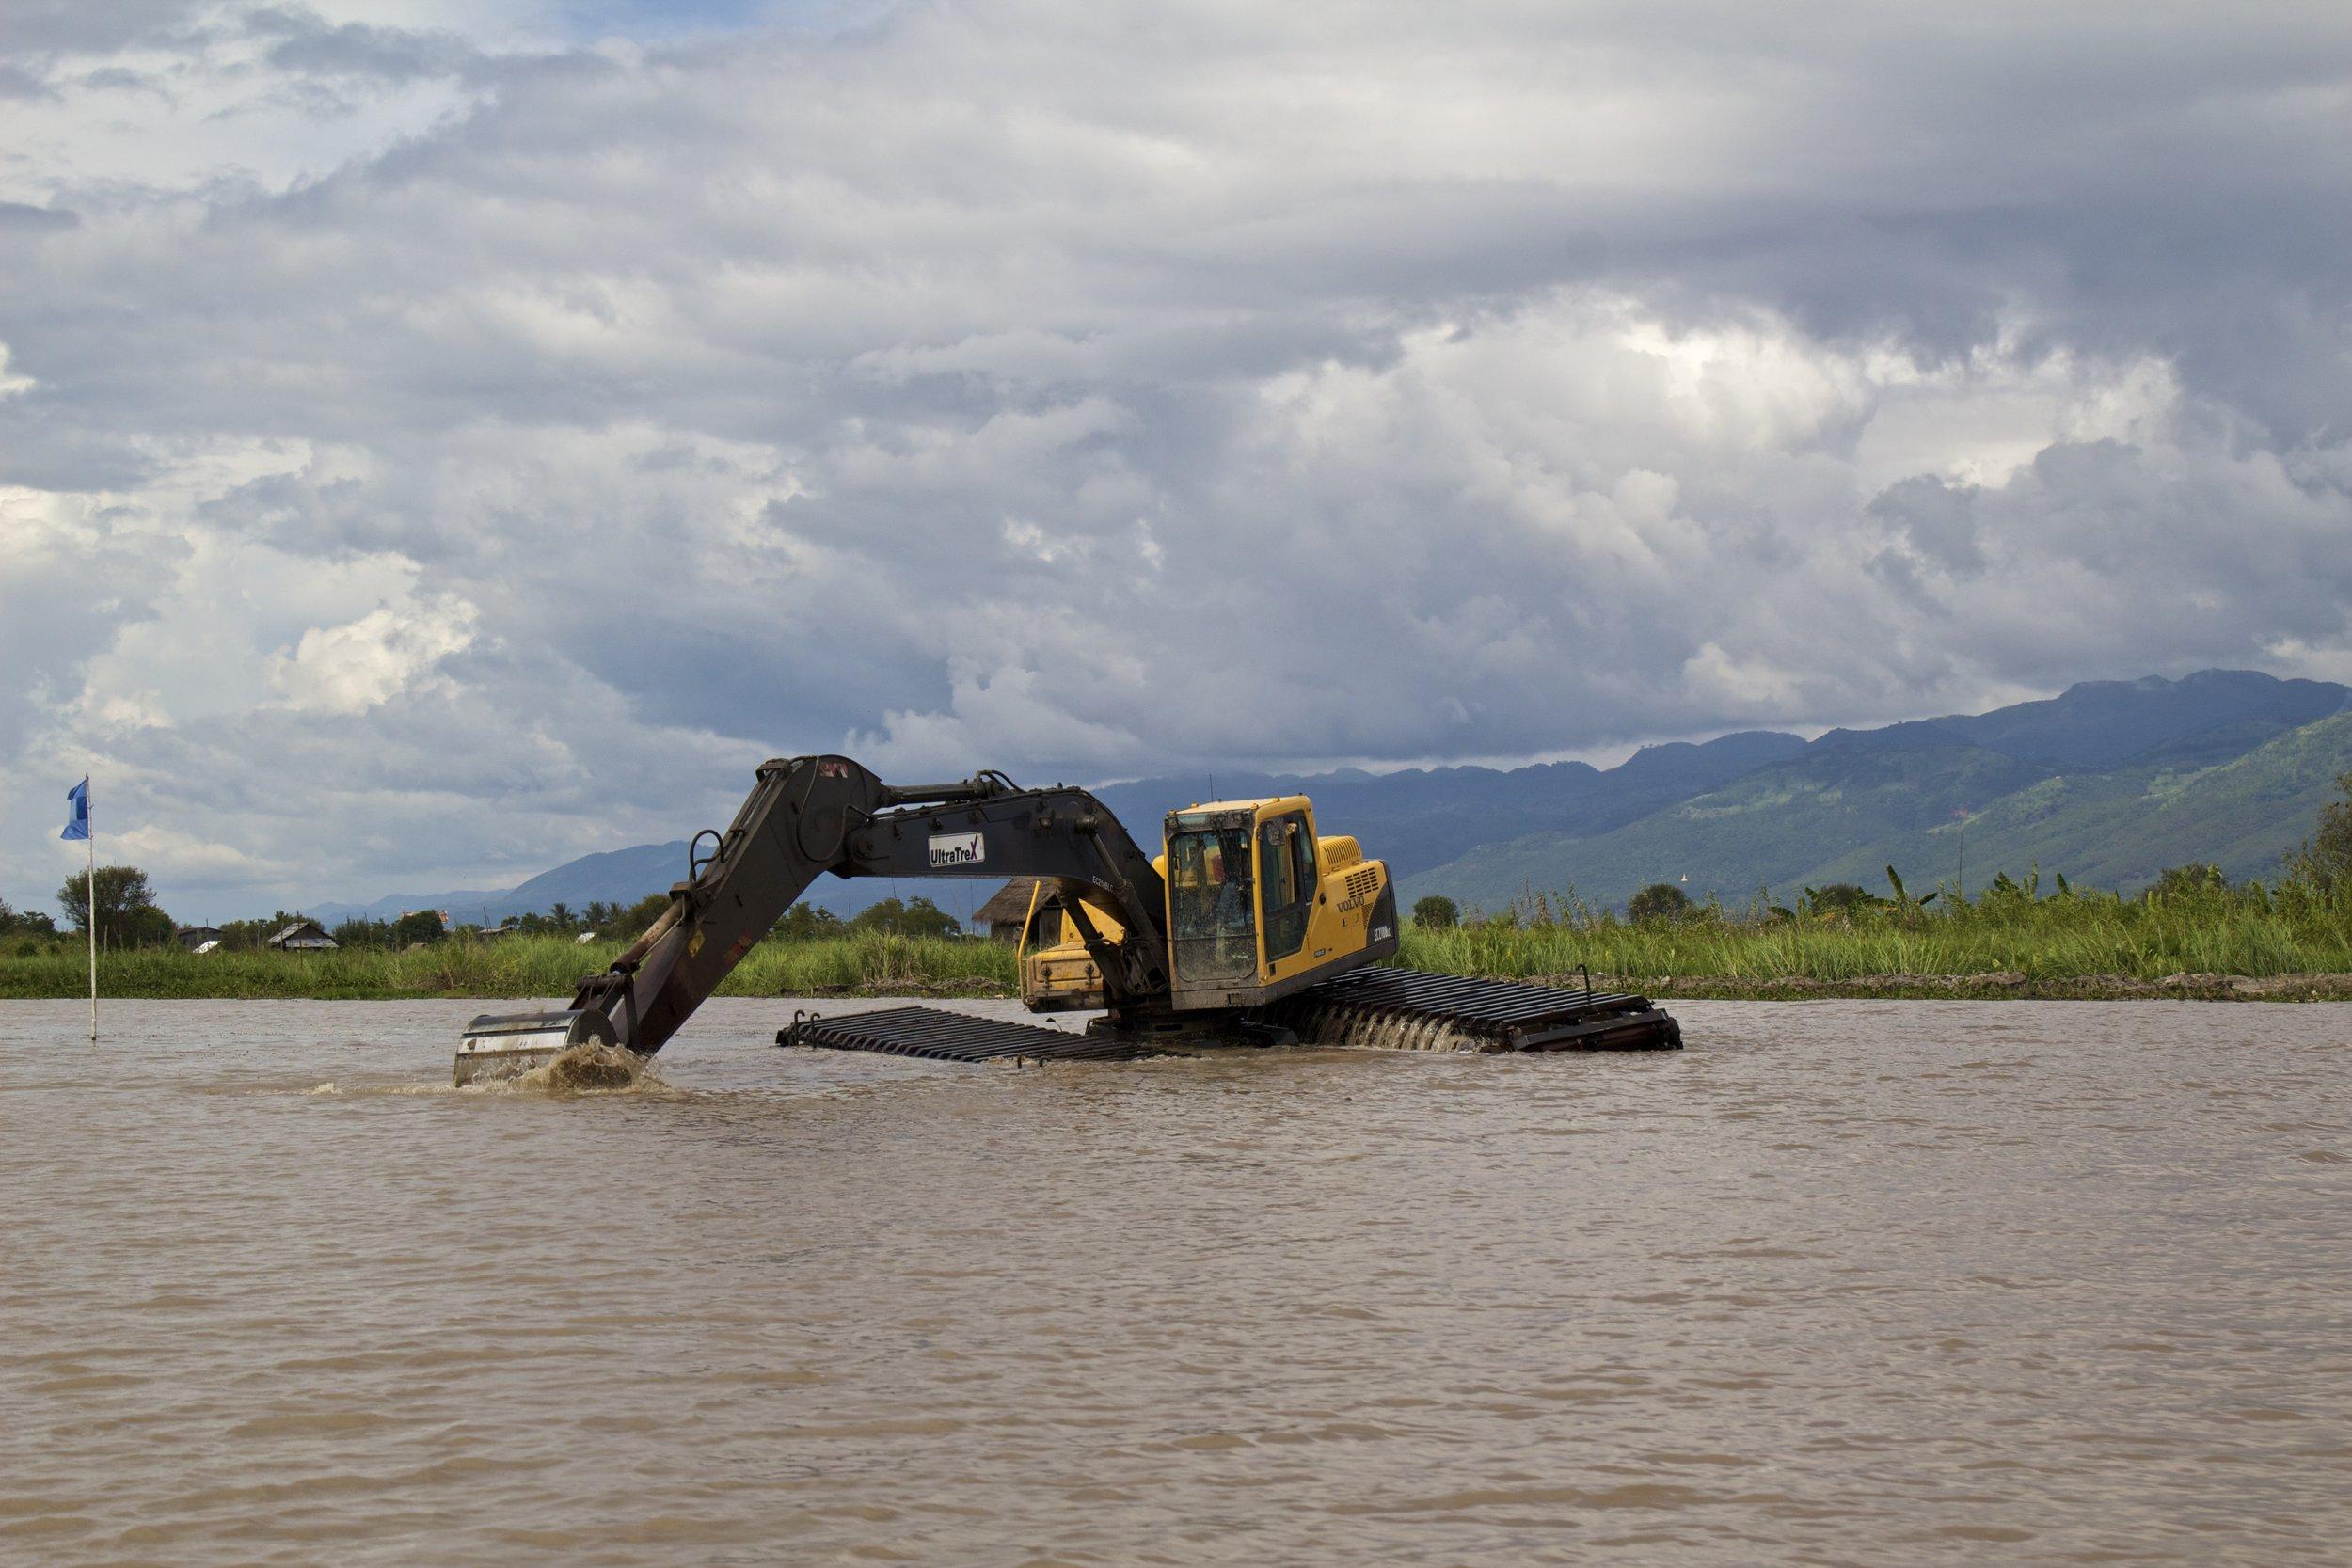 burma myanmar inle lake shan state 22.jpg